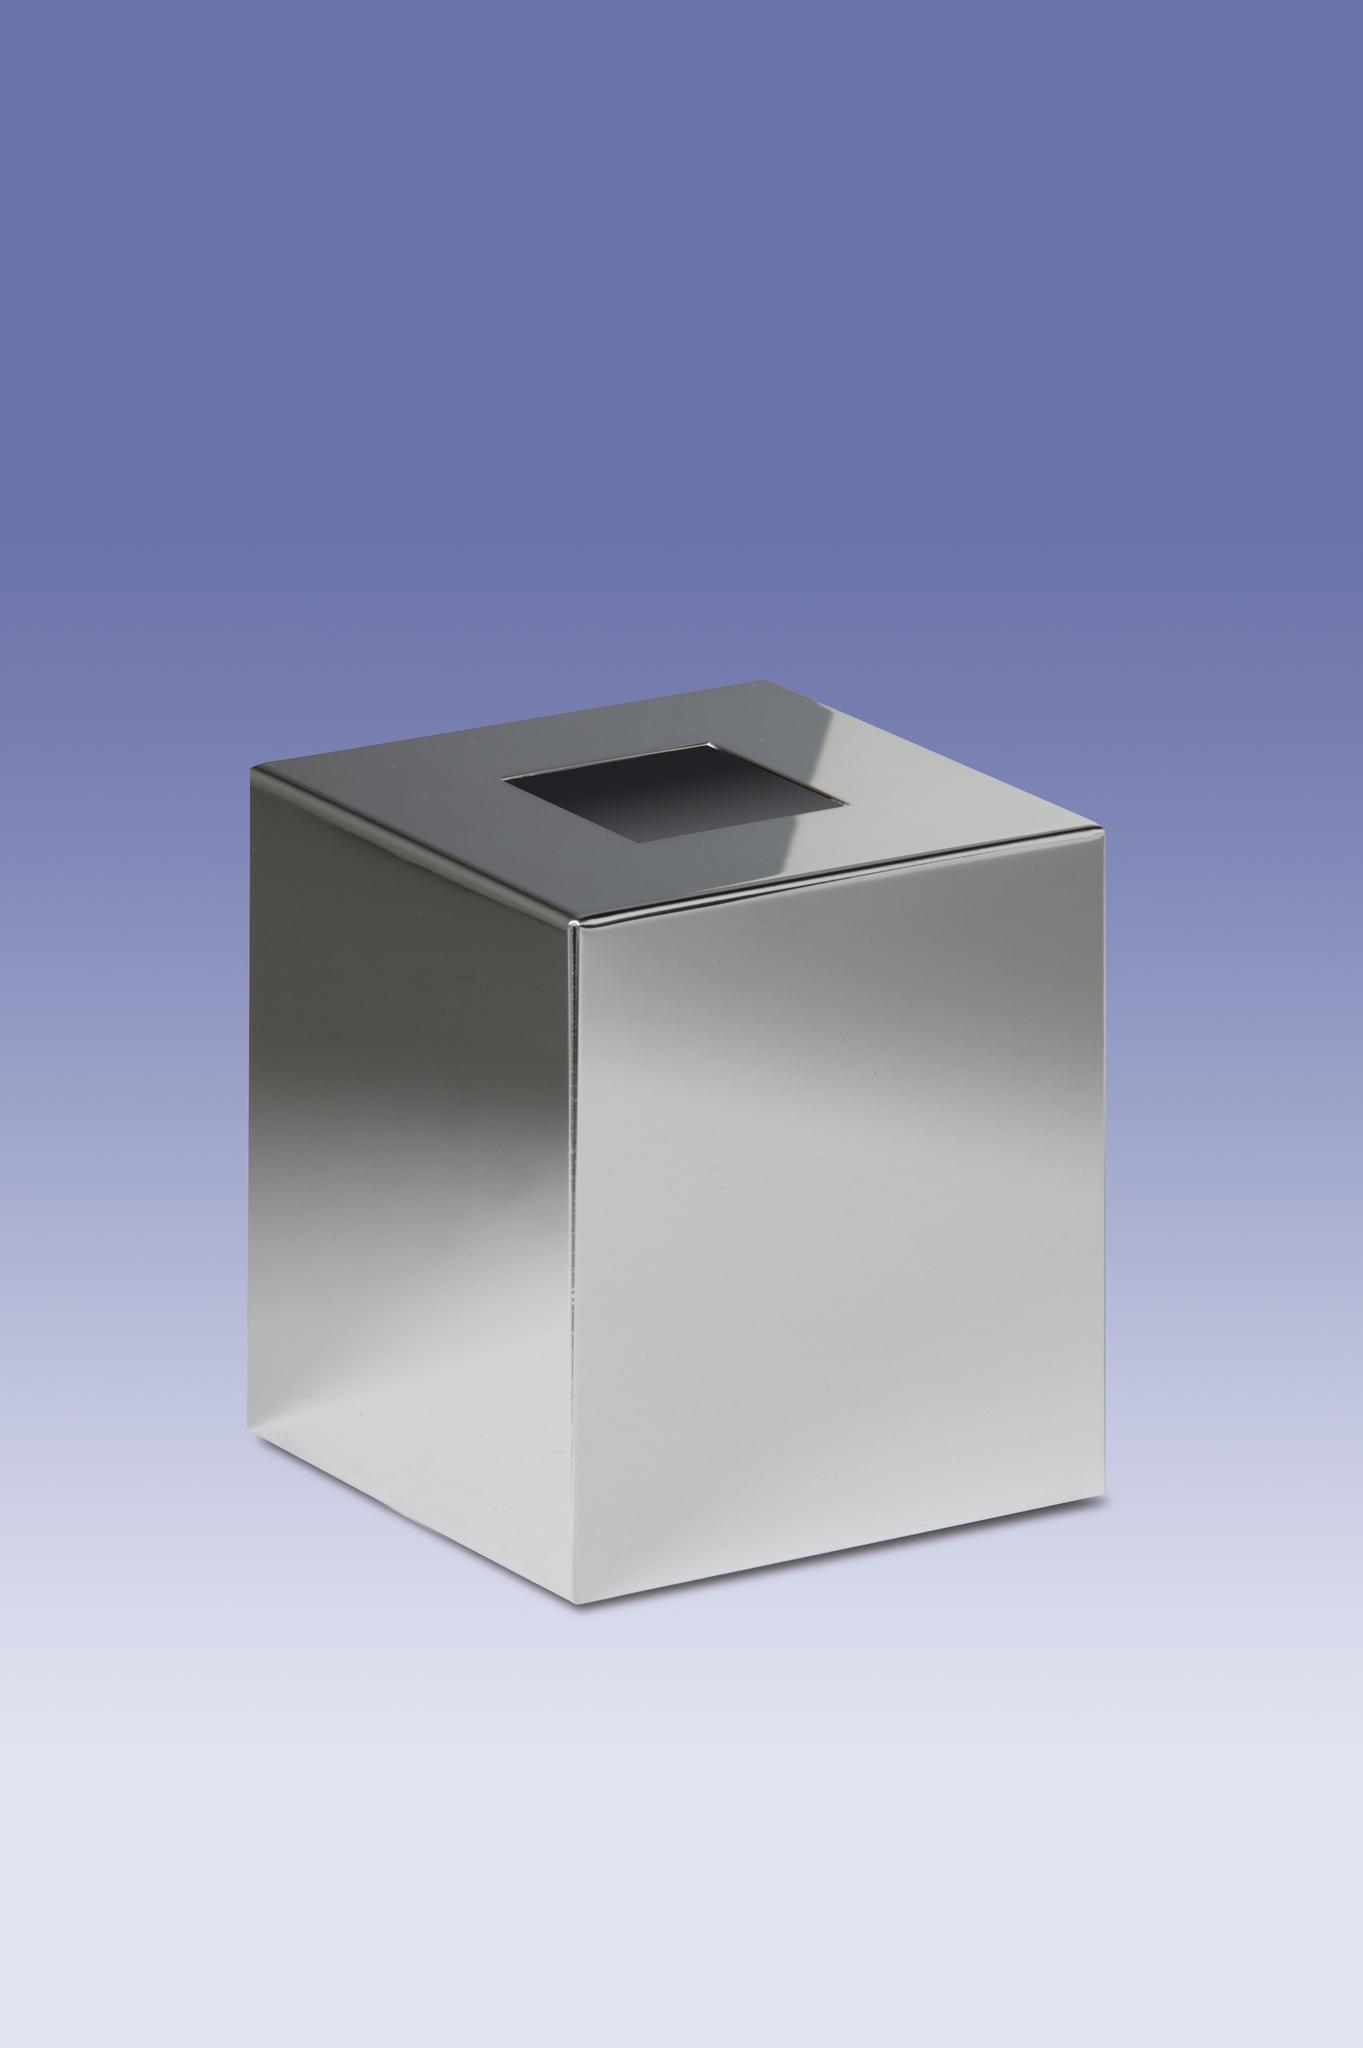 Салфетницы Салфетница квадратная Windisch 87137CR Metal salfetnitsa-kvadratnaya-87137-metal-ot-windisch-ispaniya.jpg